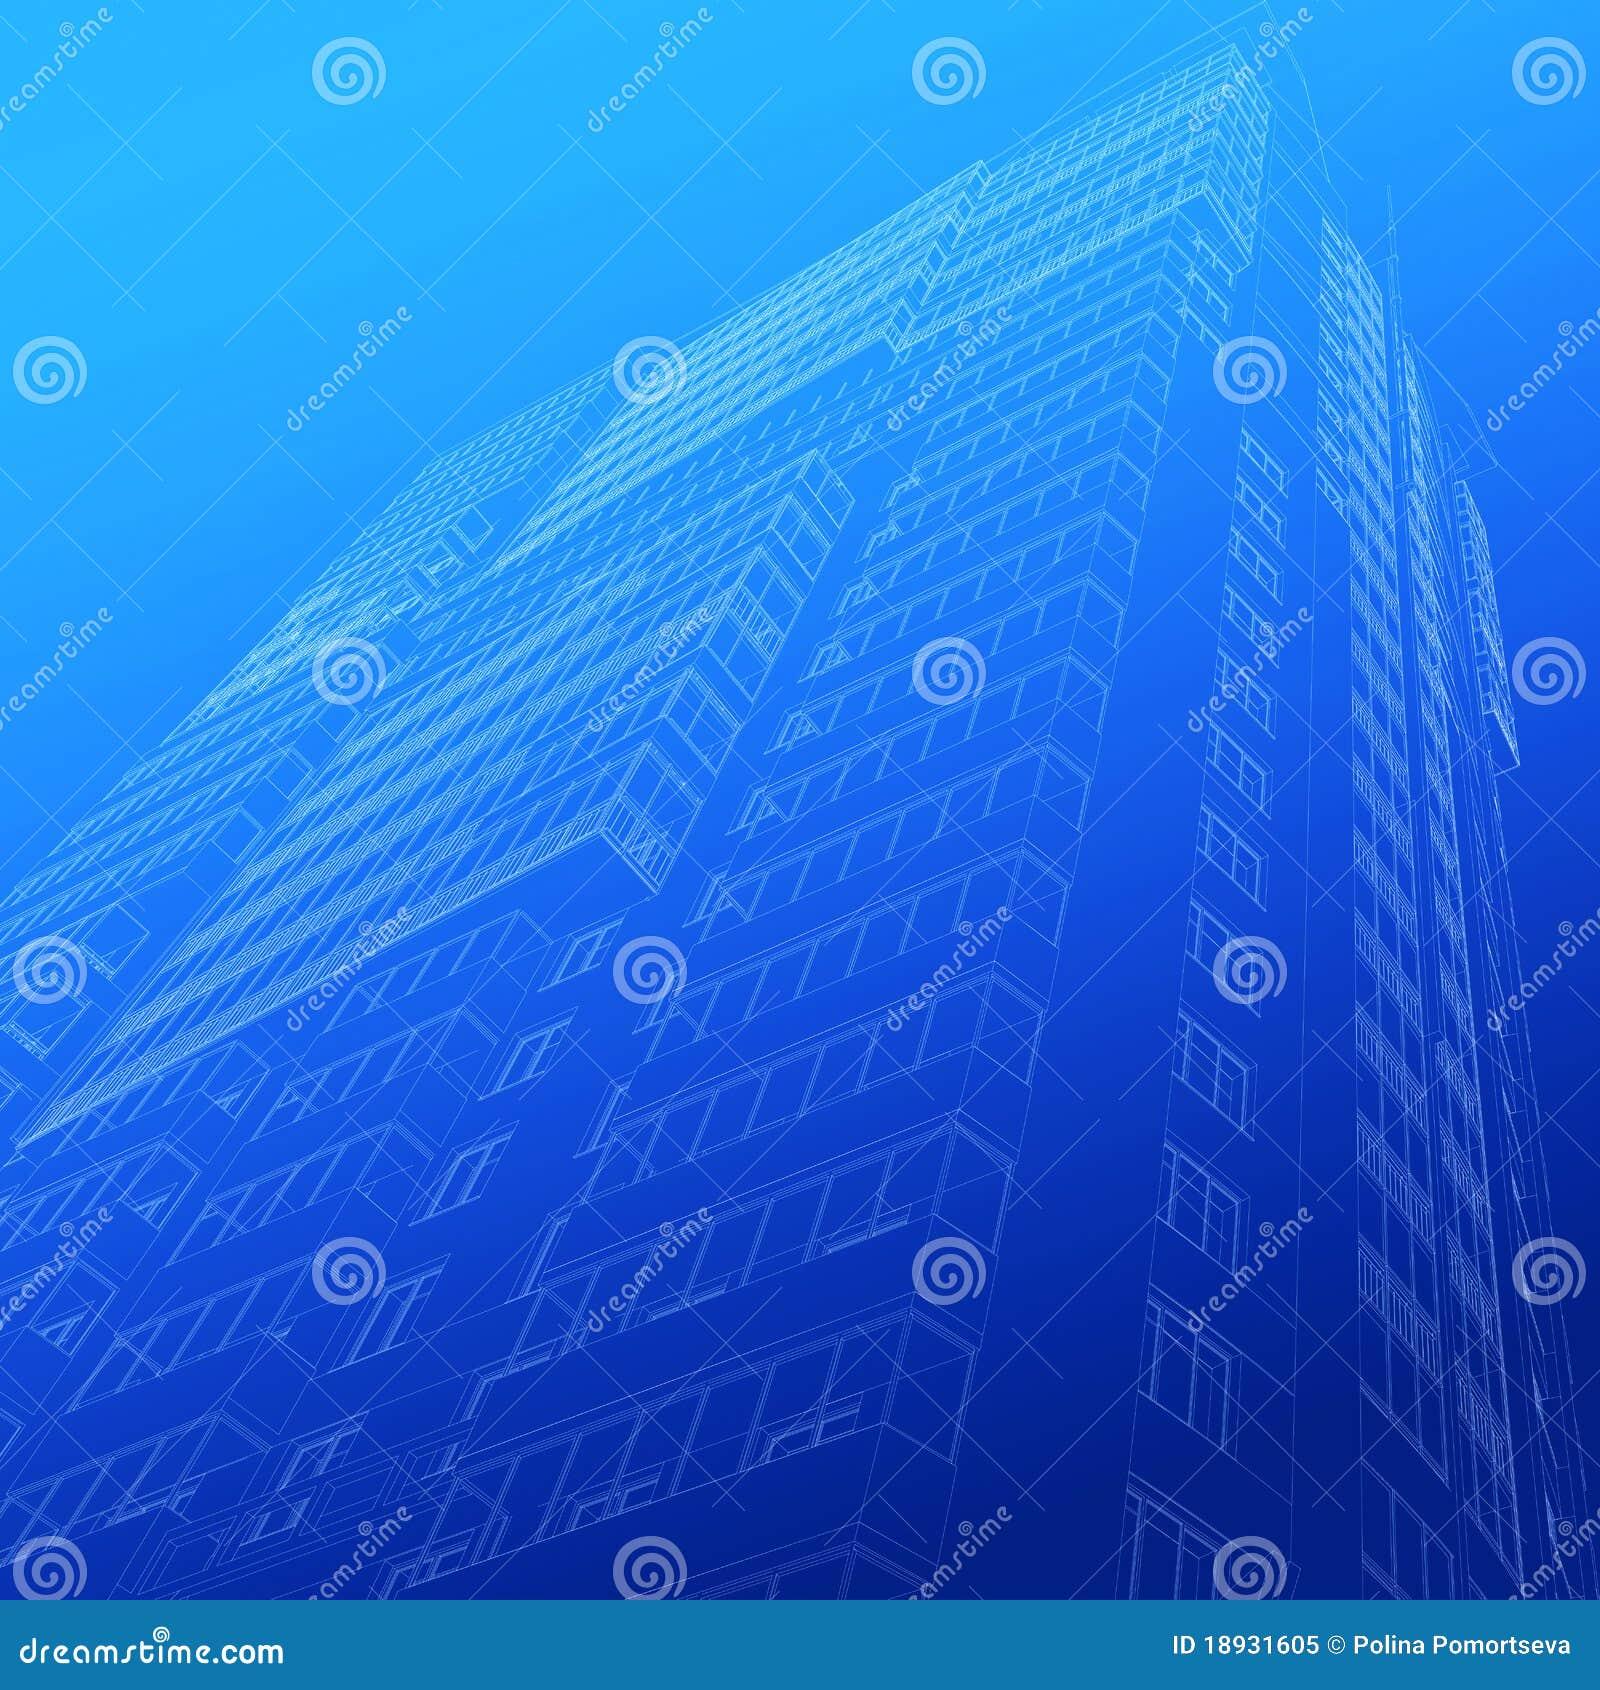 Arkitektonisk byggnad skissar